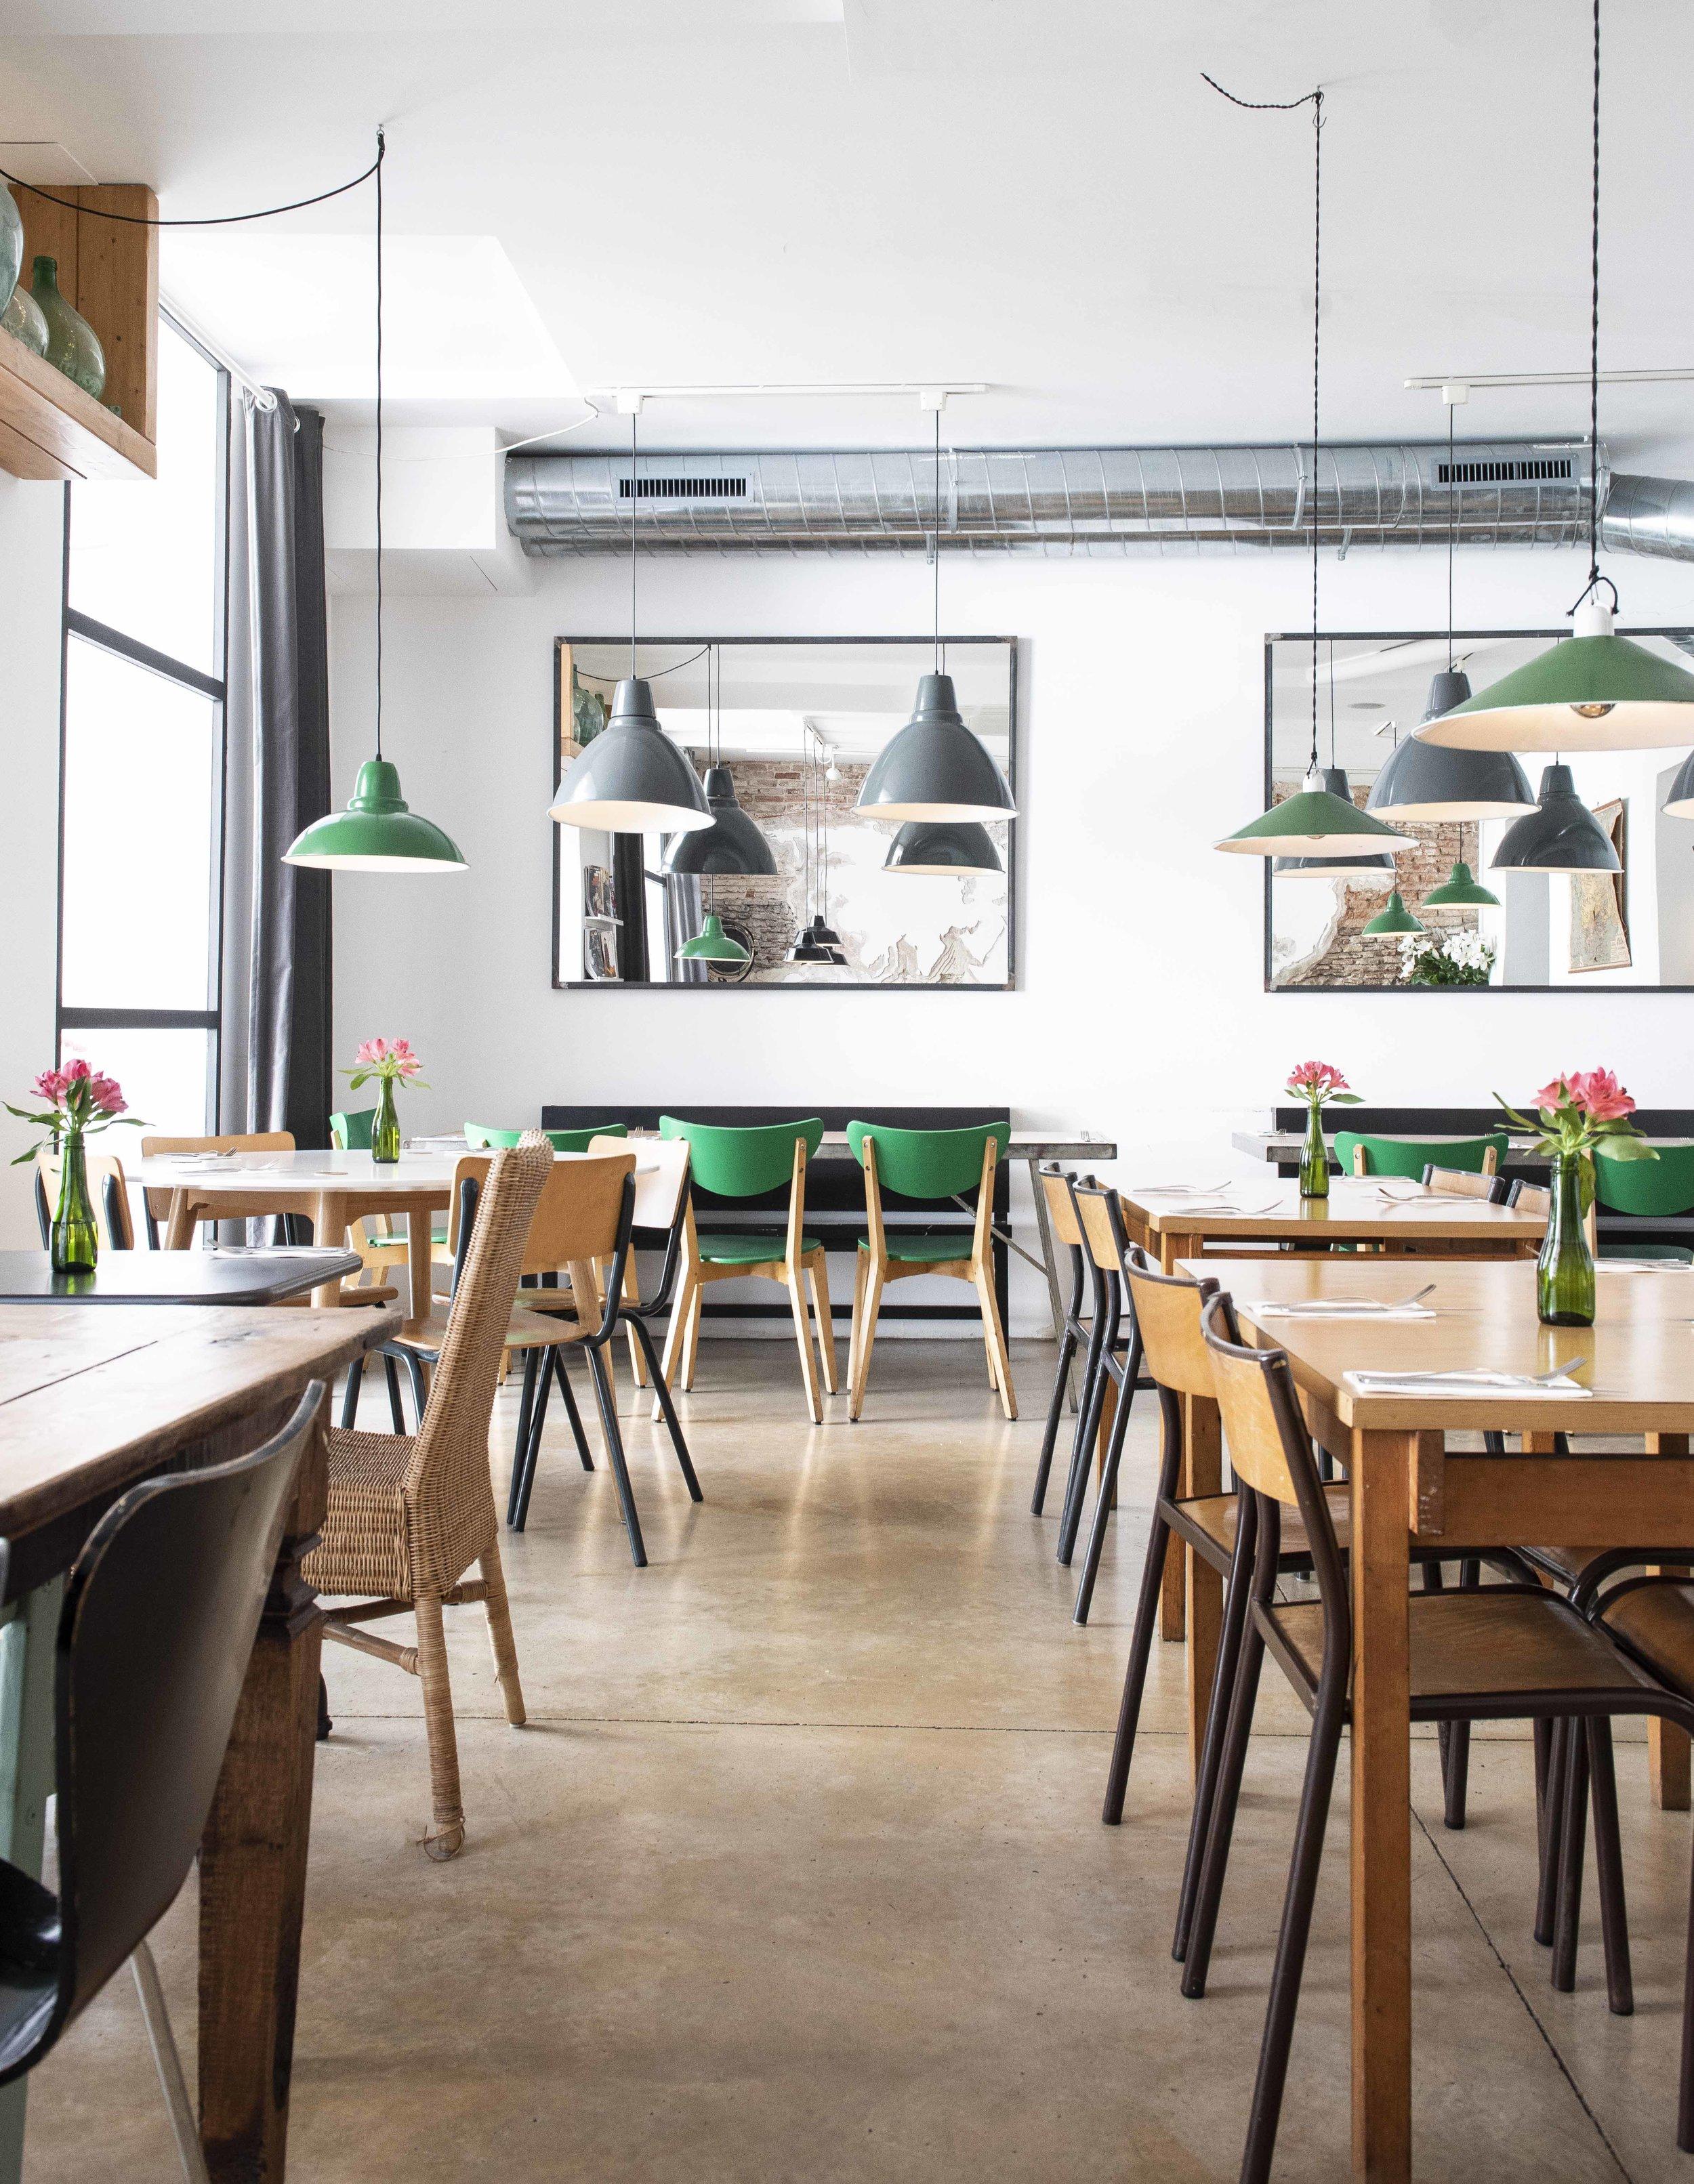 Trópico, Barcelona. Photo © Barcelona Food Experience.